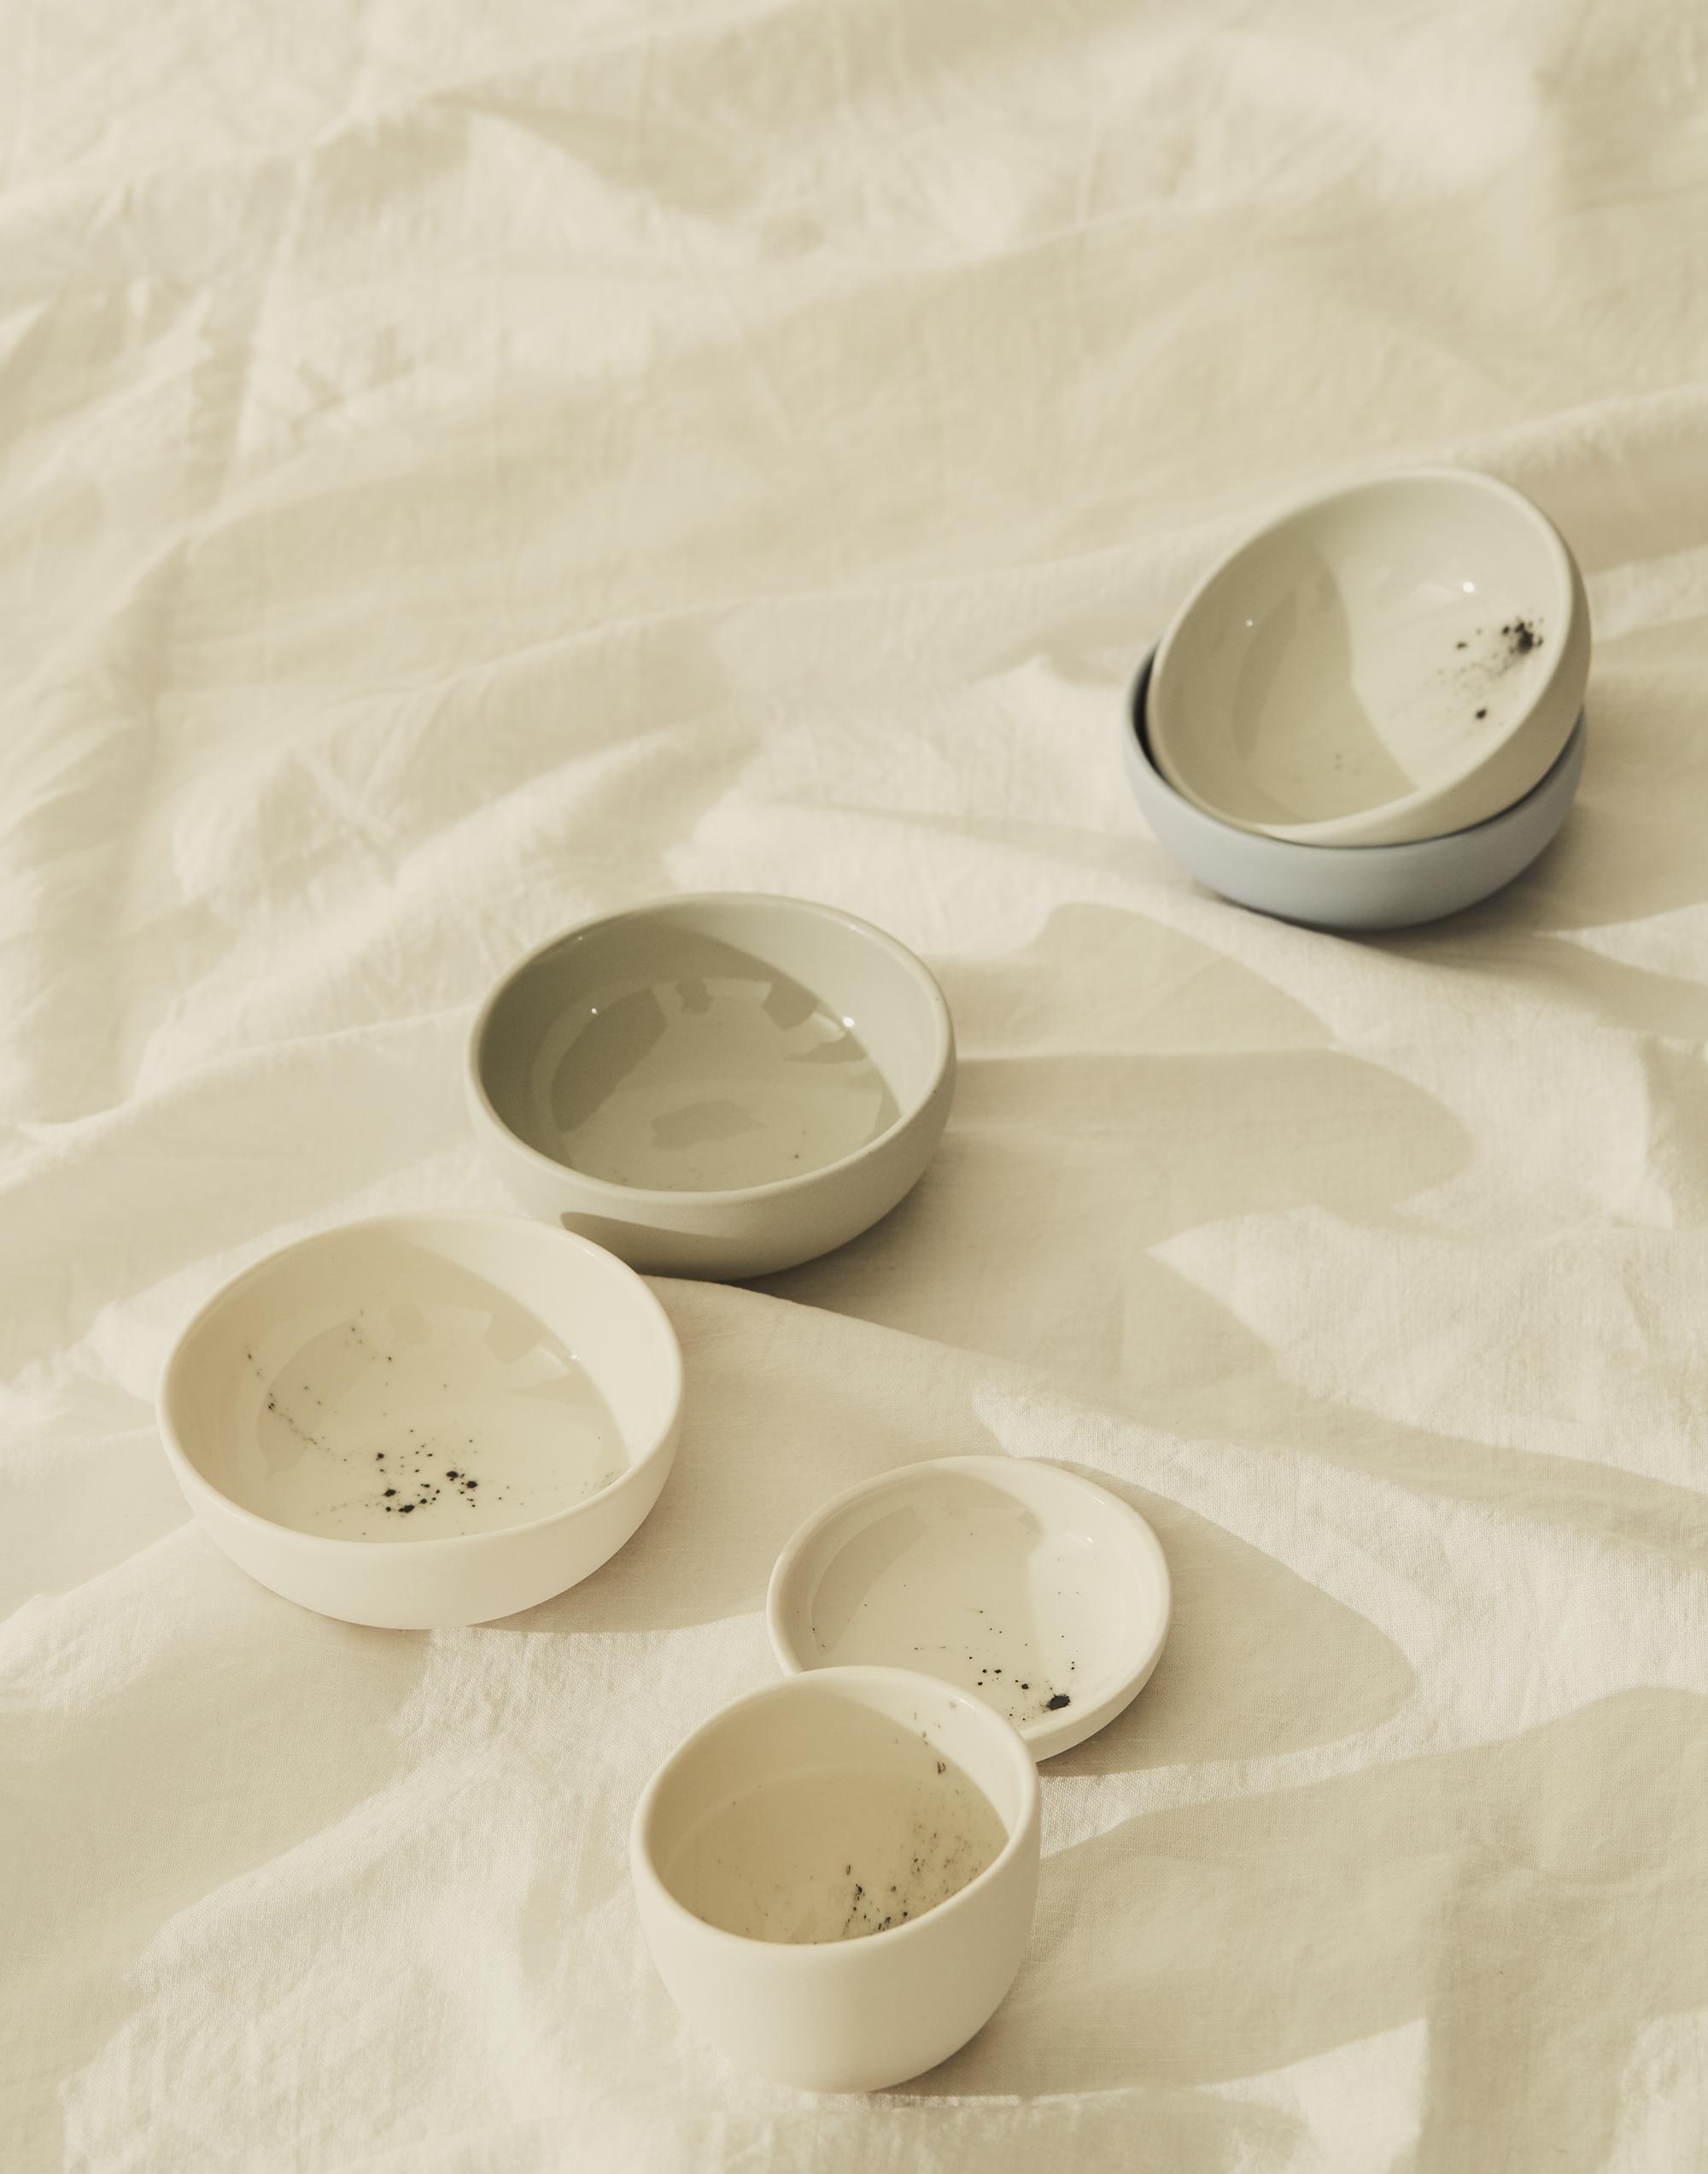 Multipurpose 'Stardust' ceramics from Studio Enti to adorn the home.